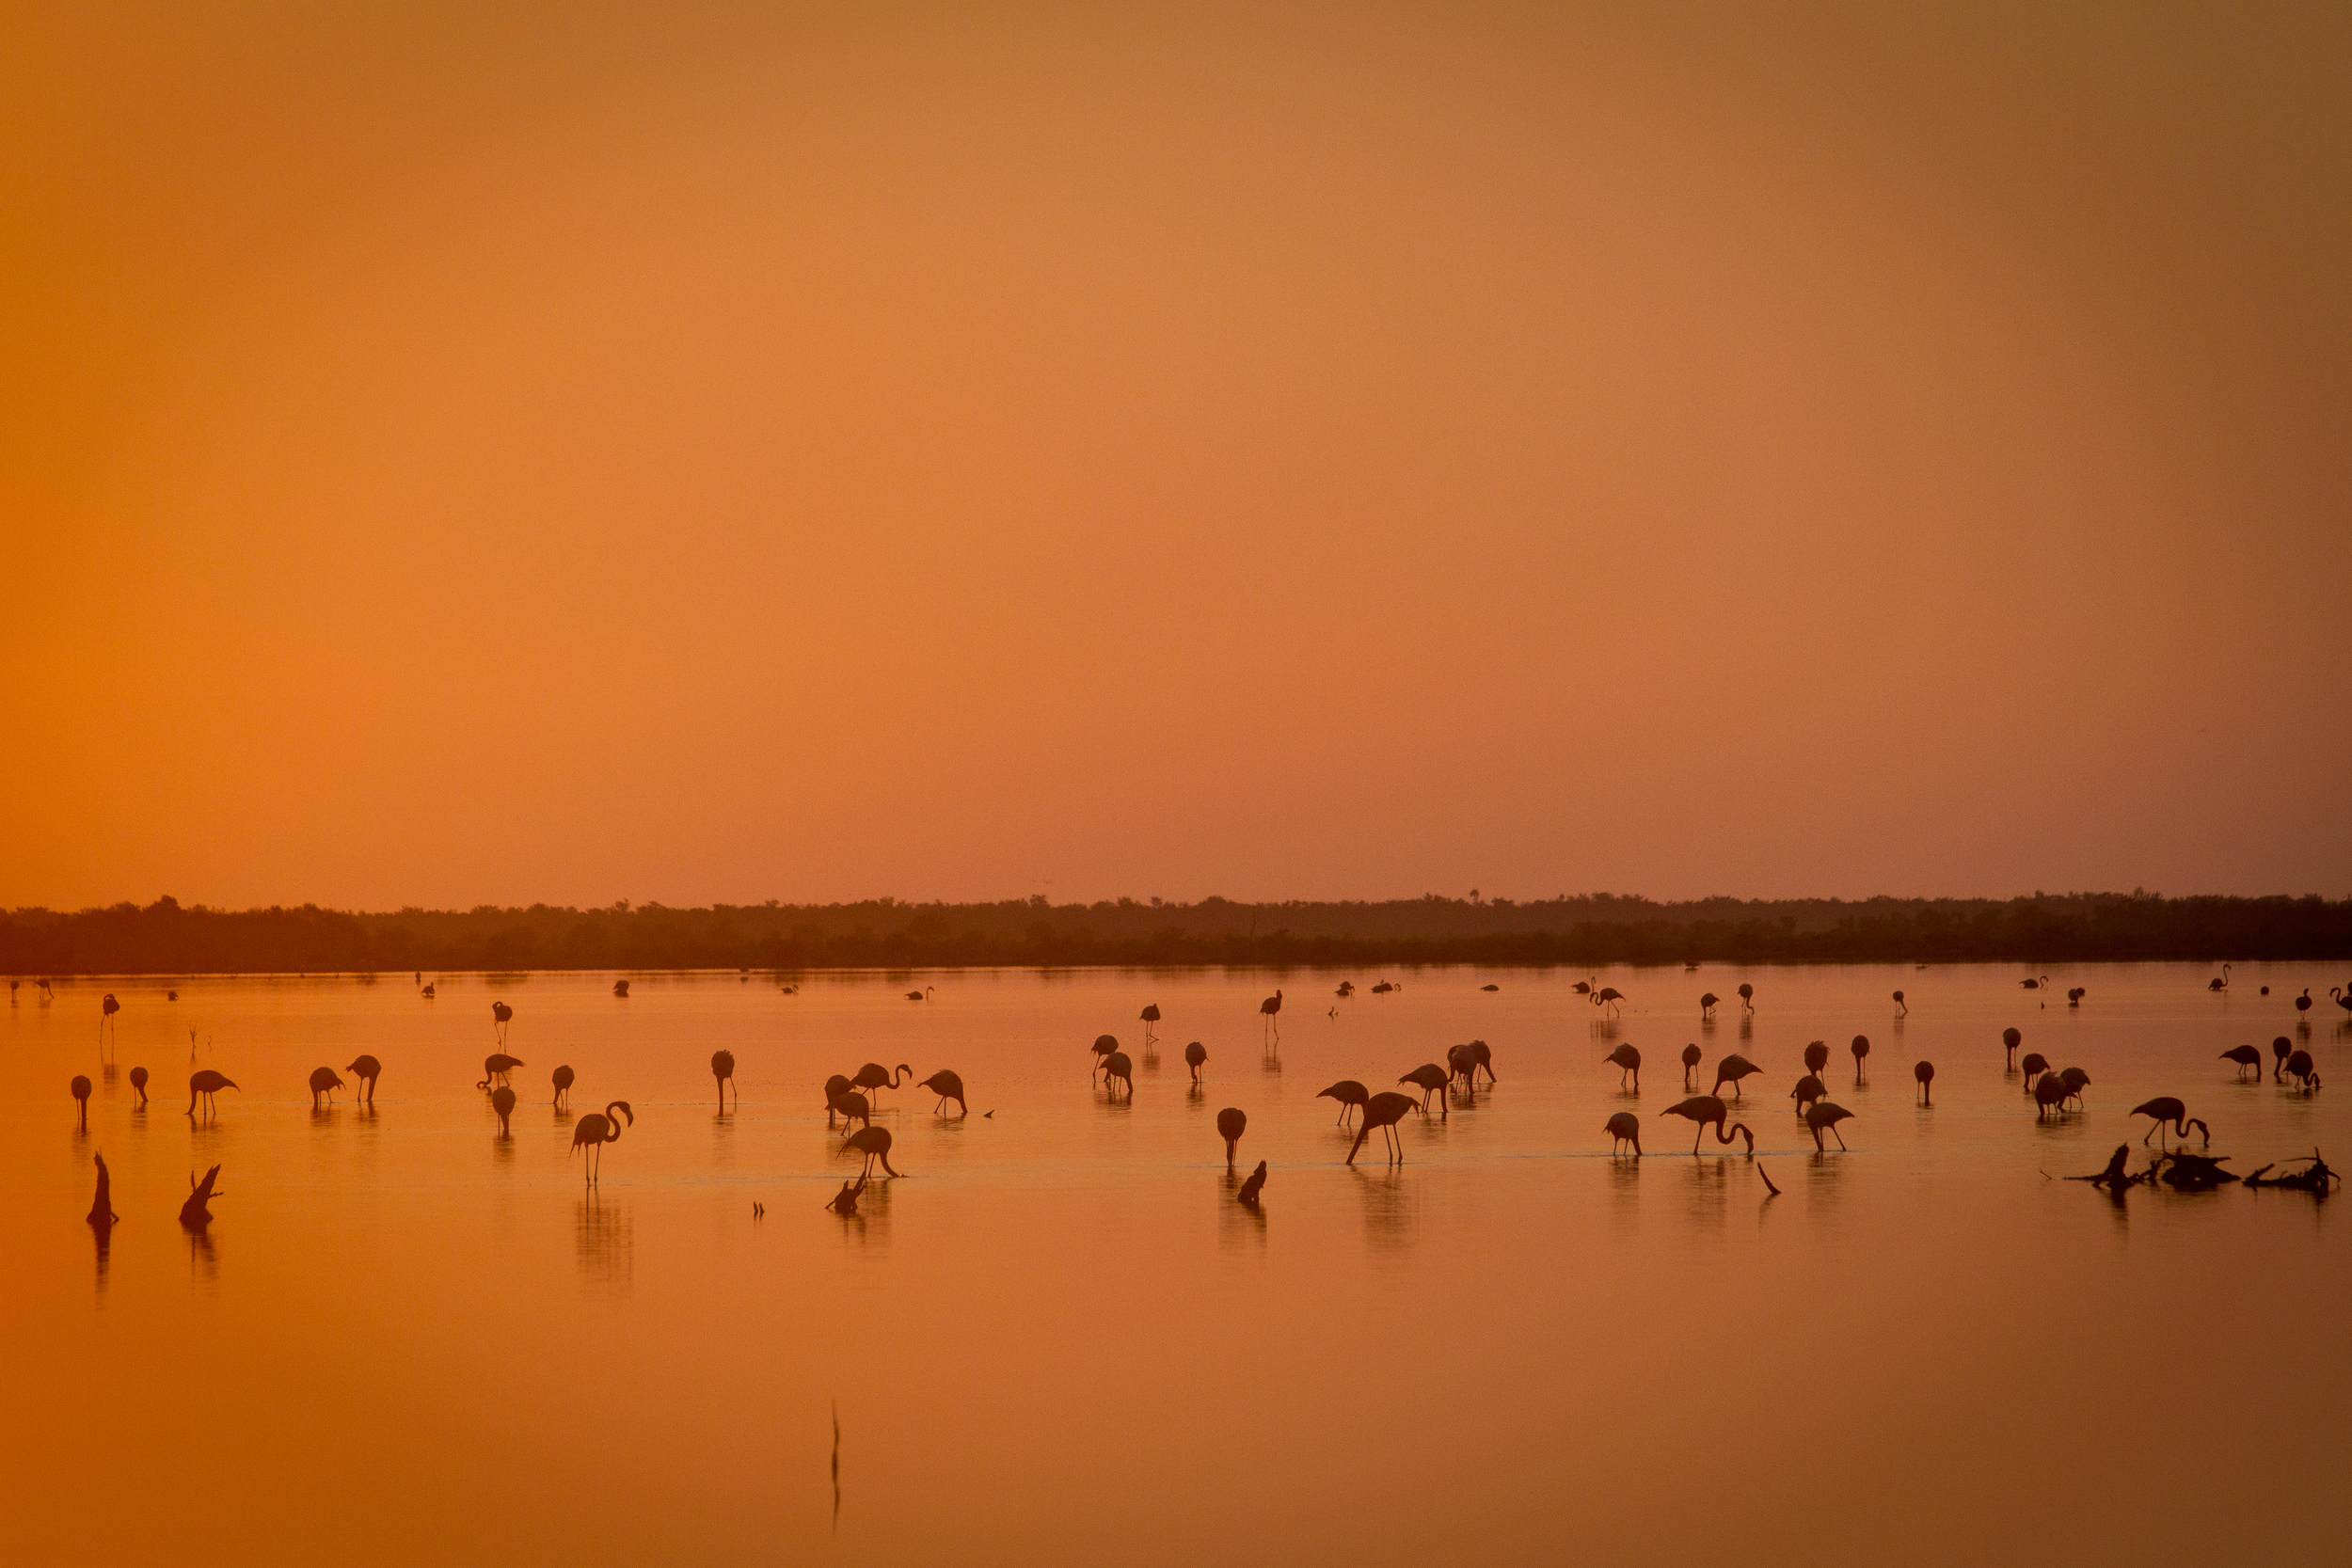 Wading Birds are plentiful